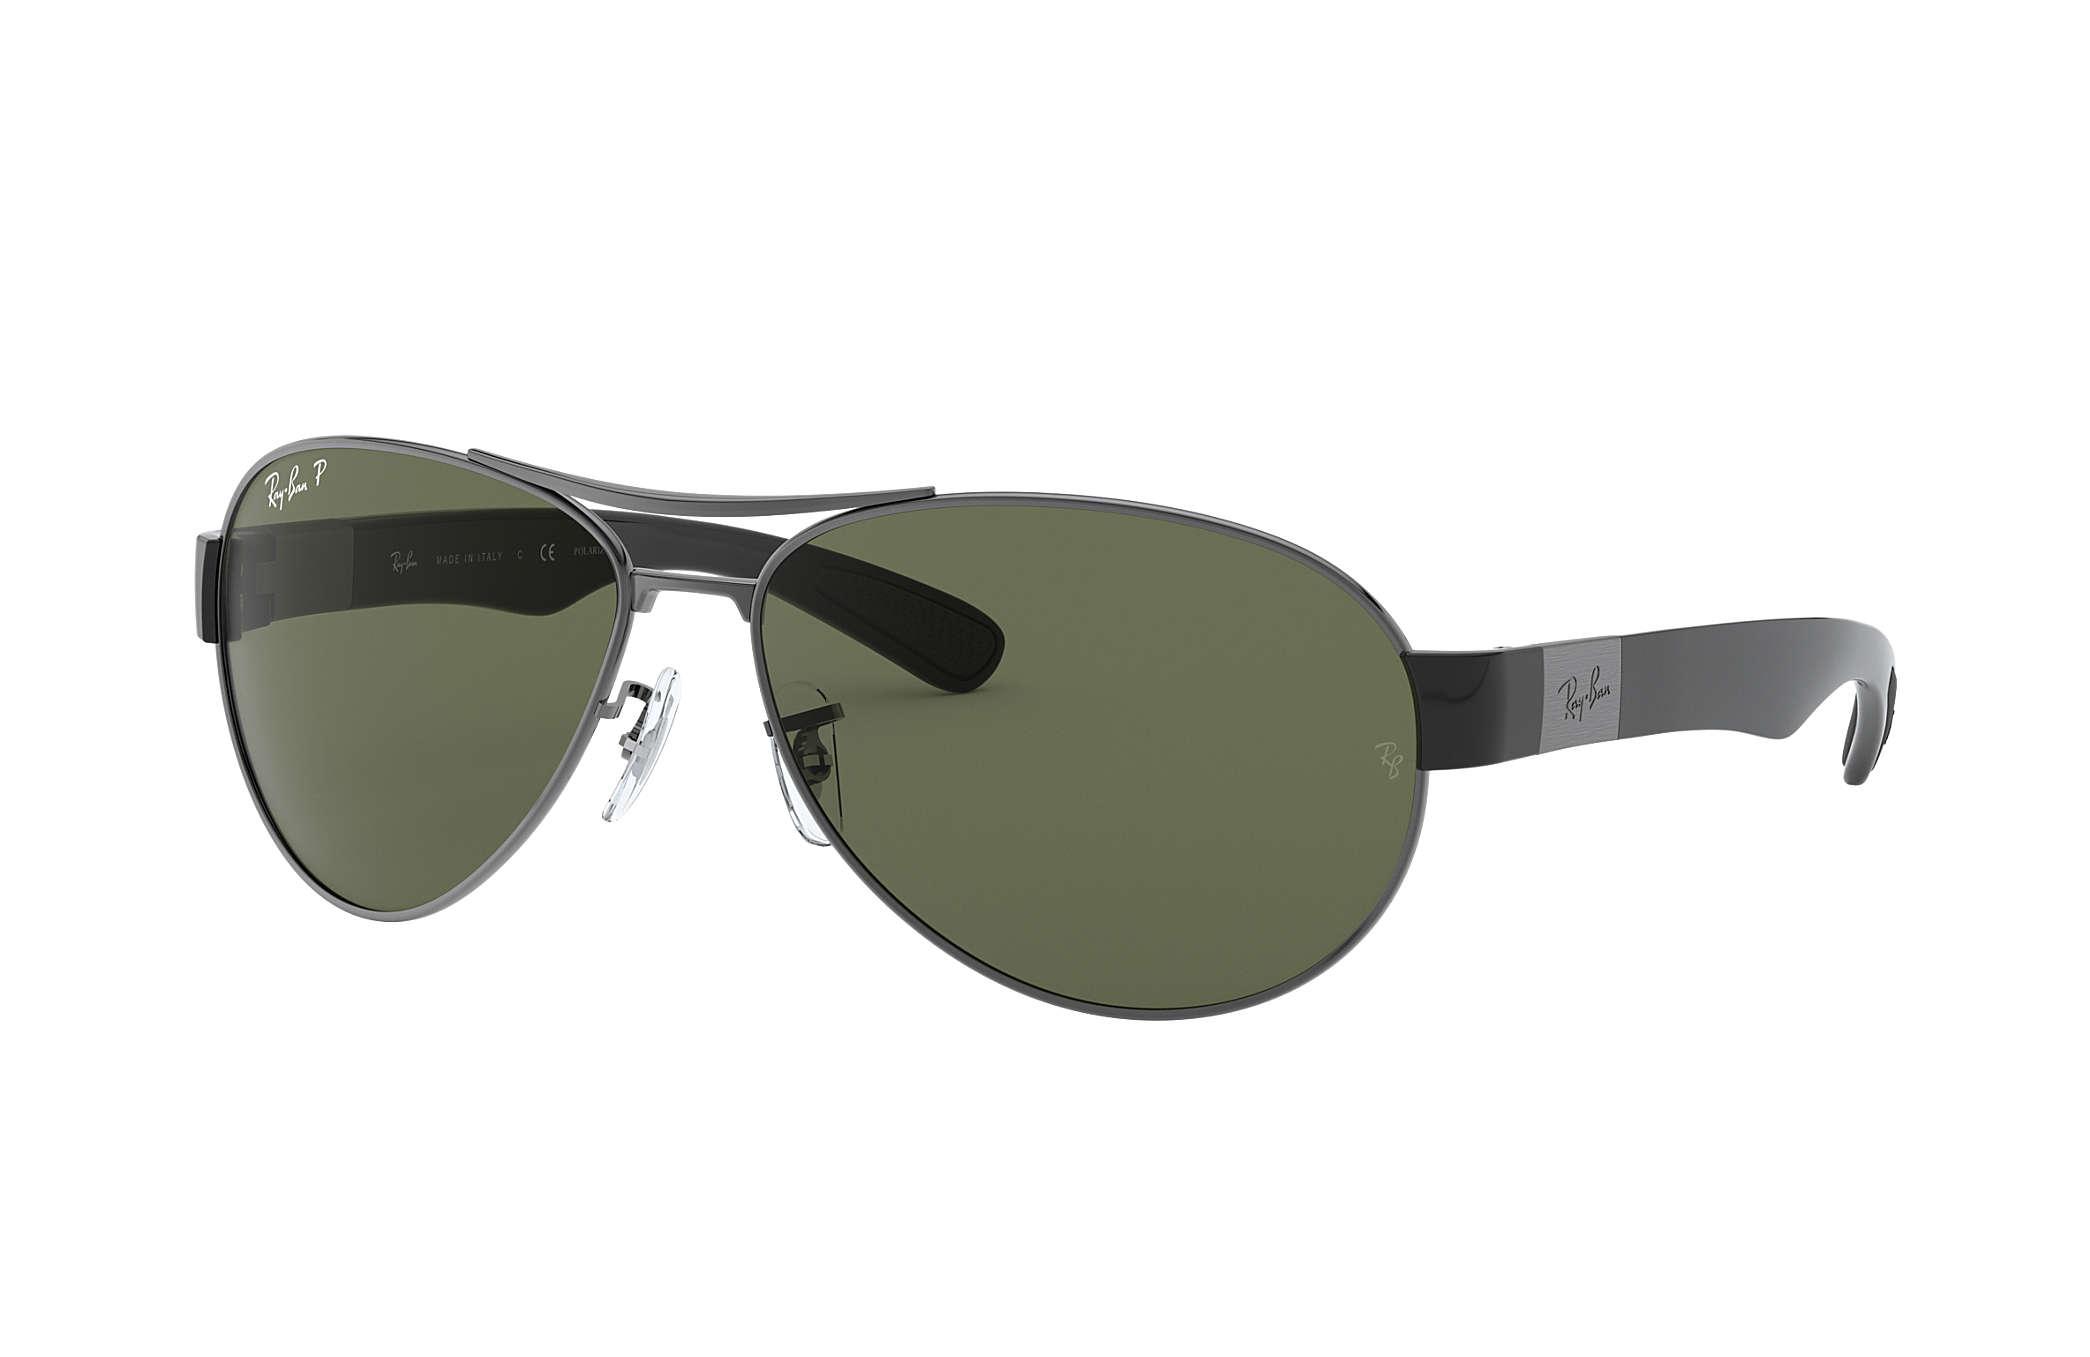 e3777d1cf1 Ray-Ban RB3509 Gunmetal - Metal - Green Polarized Lenses ...